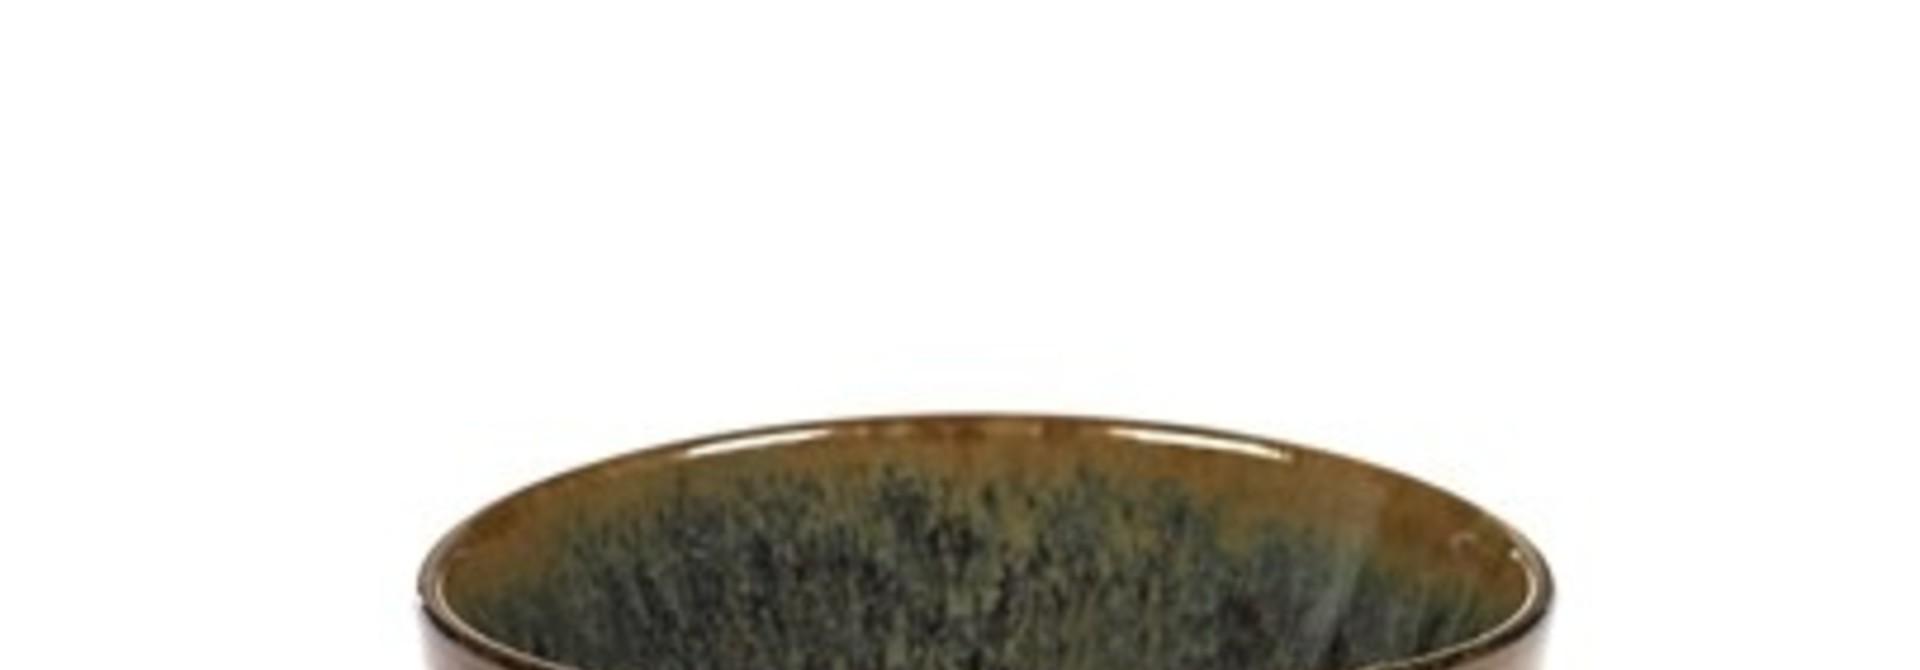 "4.5"" Ceramic Bowl - Indi Grey"